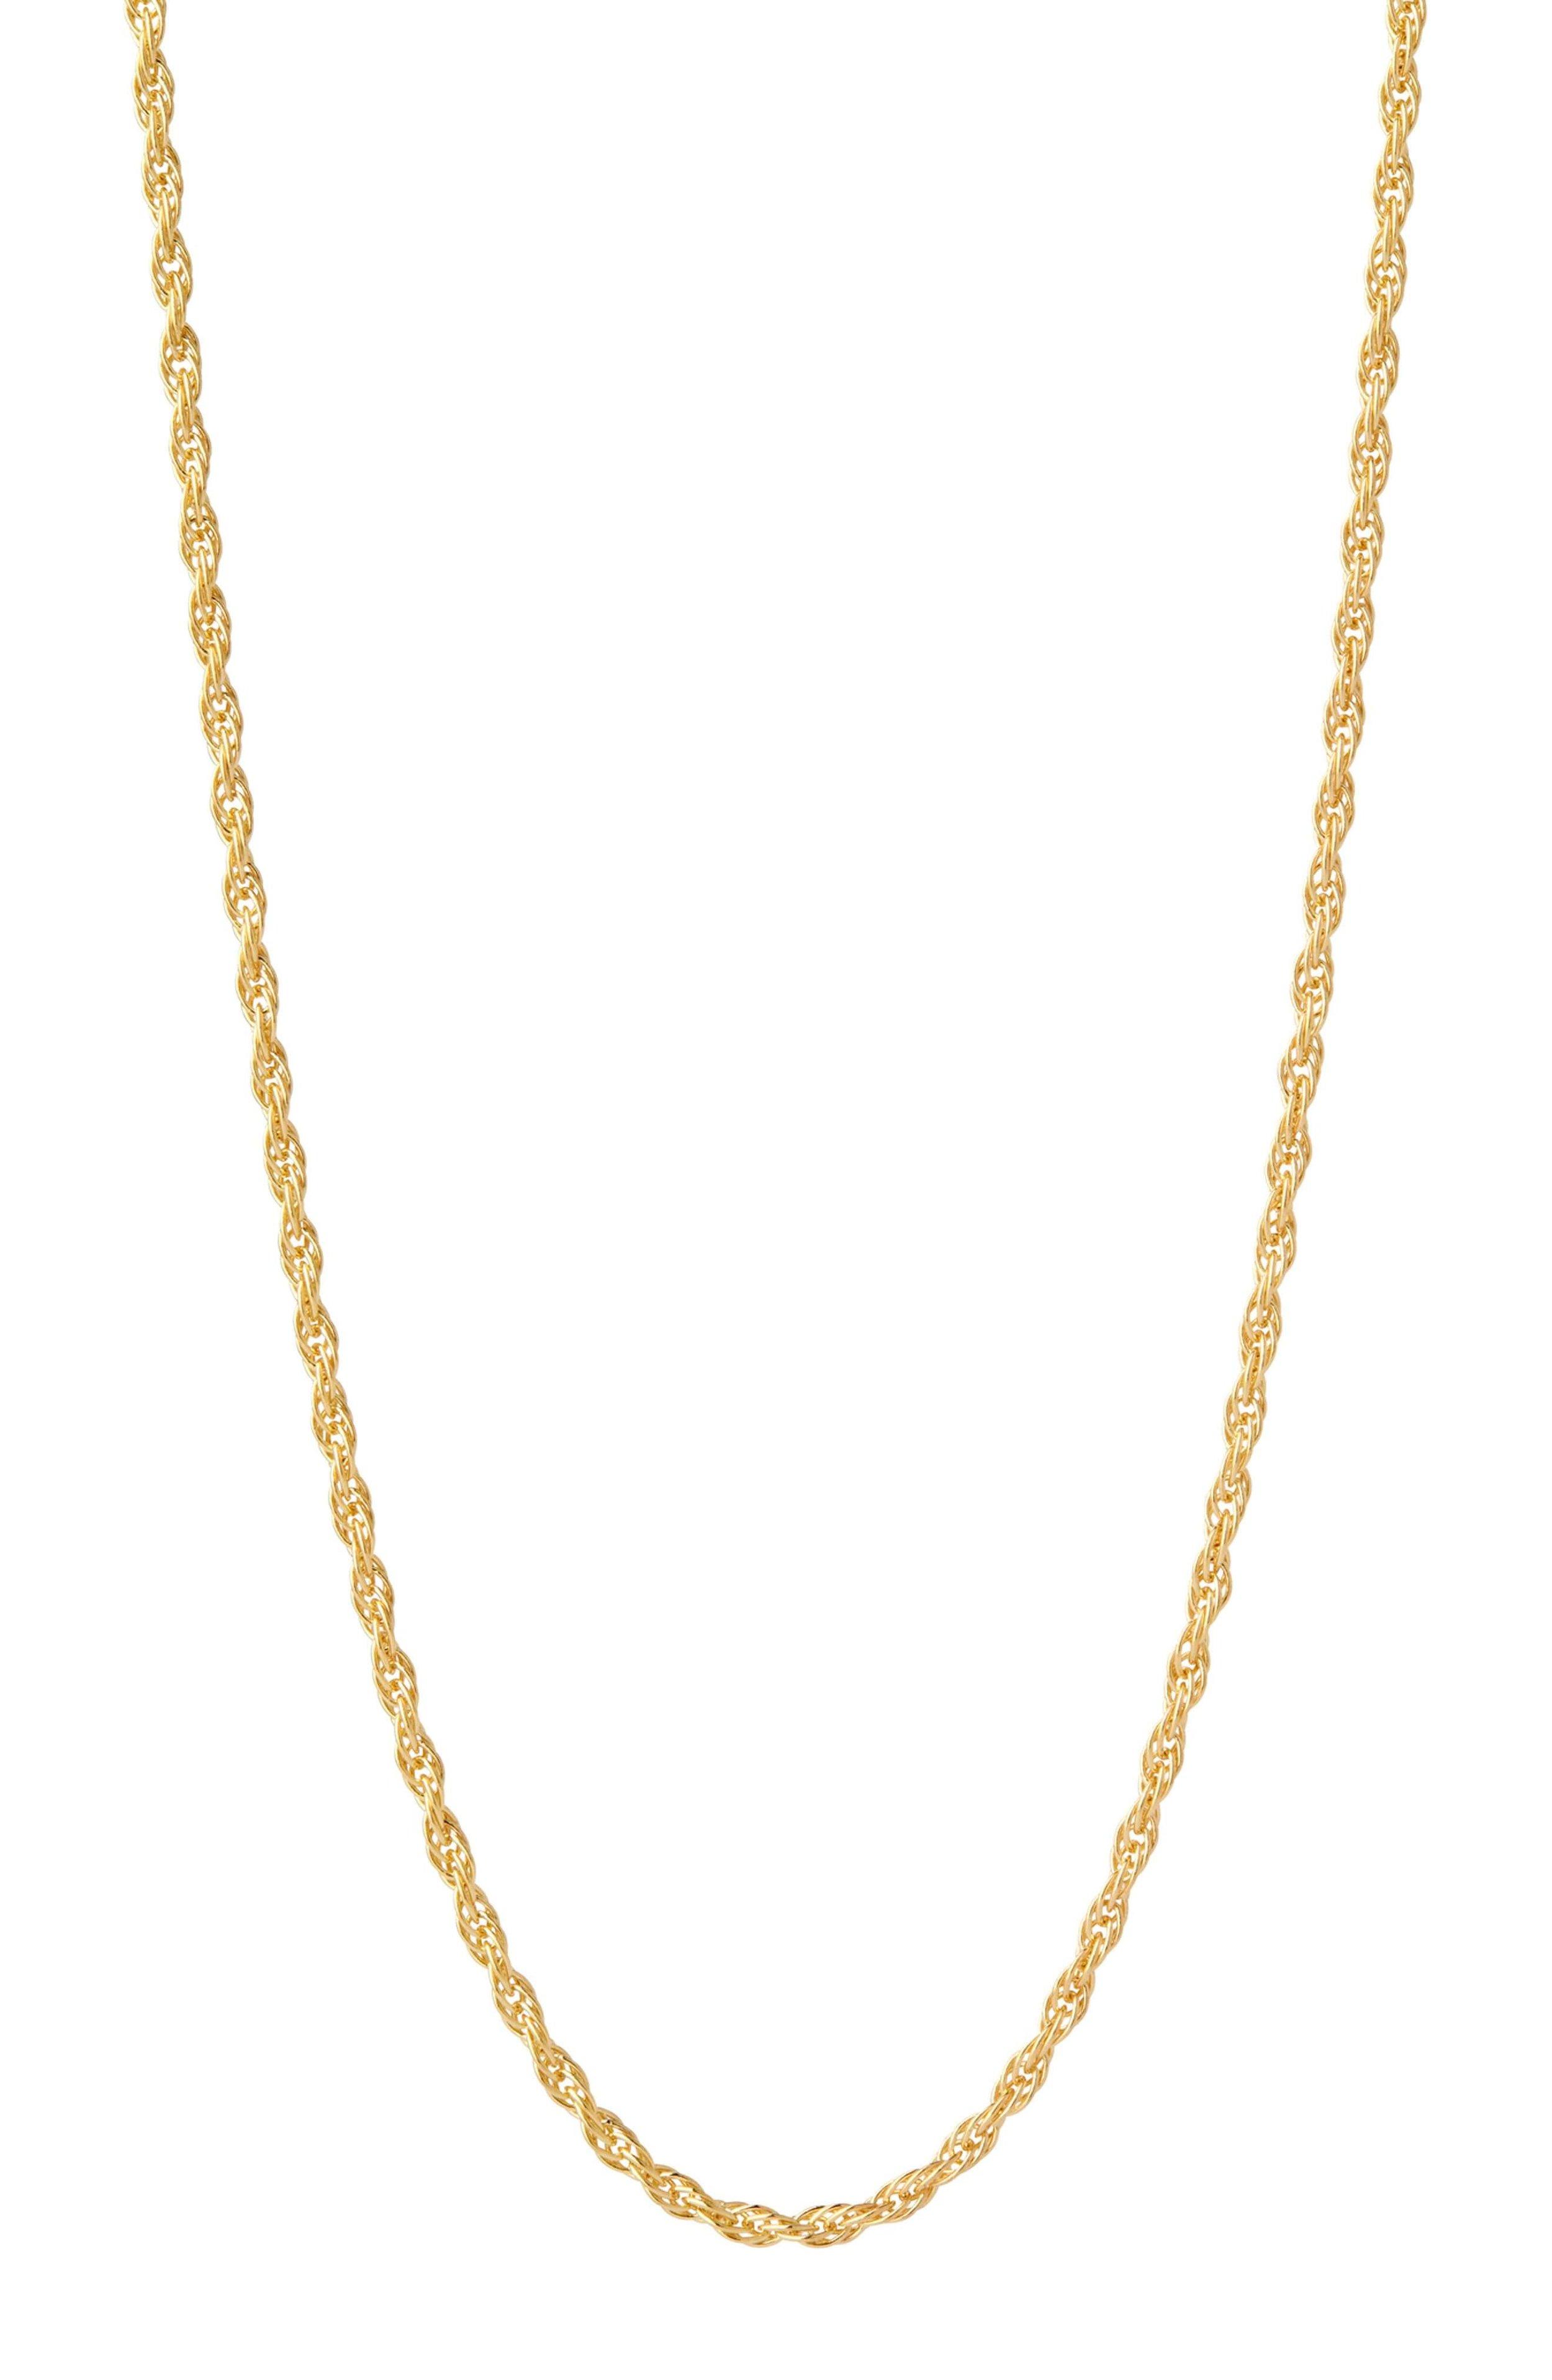 Maria Black gold Necklace